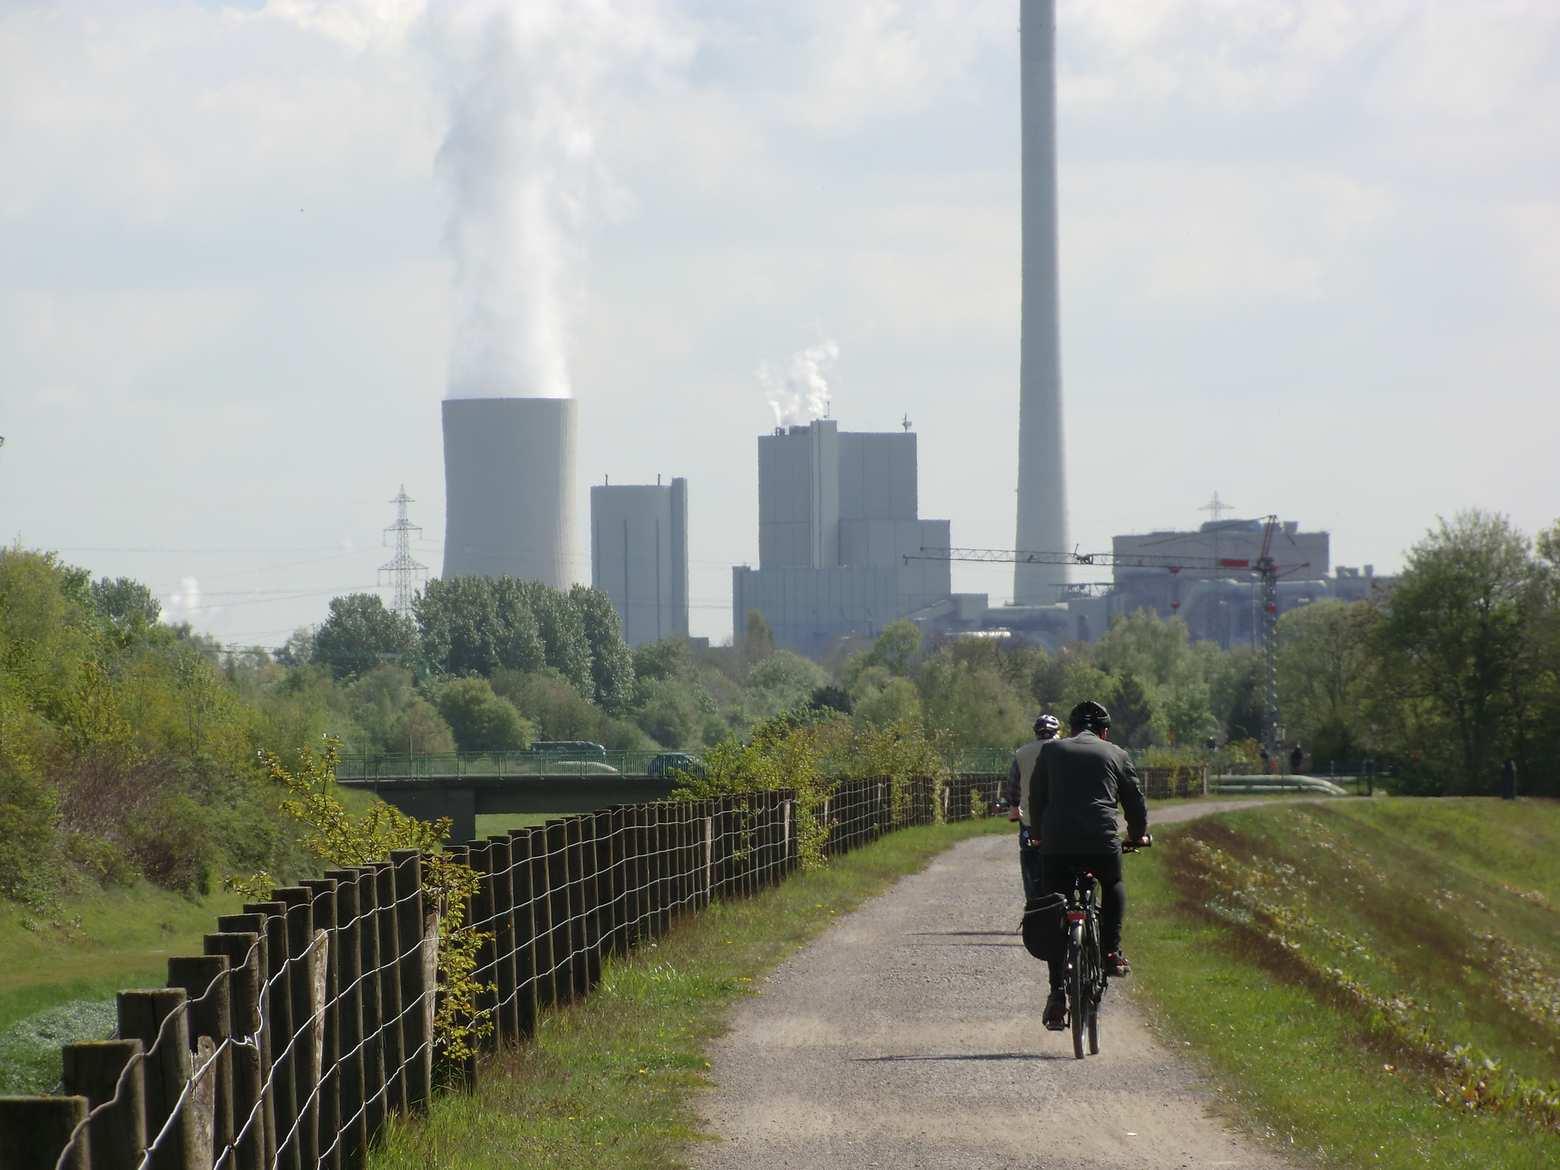 Radtouren in Nordrhein-Westfalen